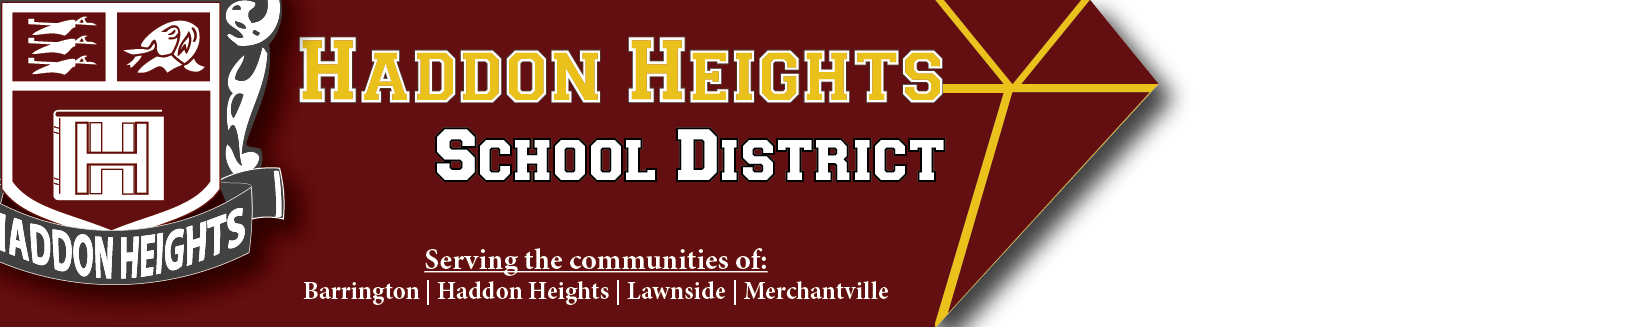 Haddon Heights School District logo